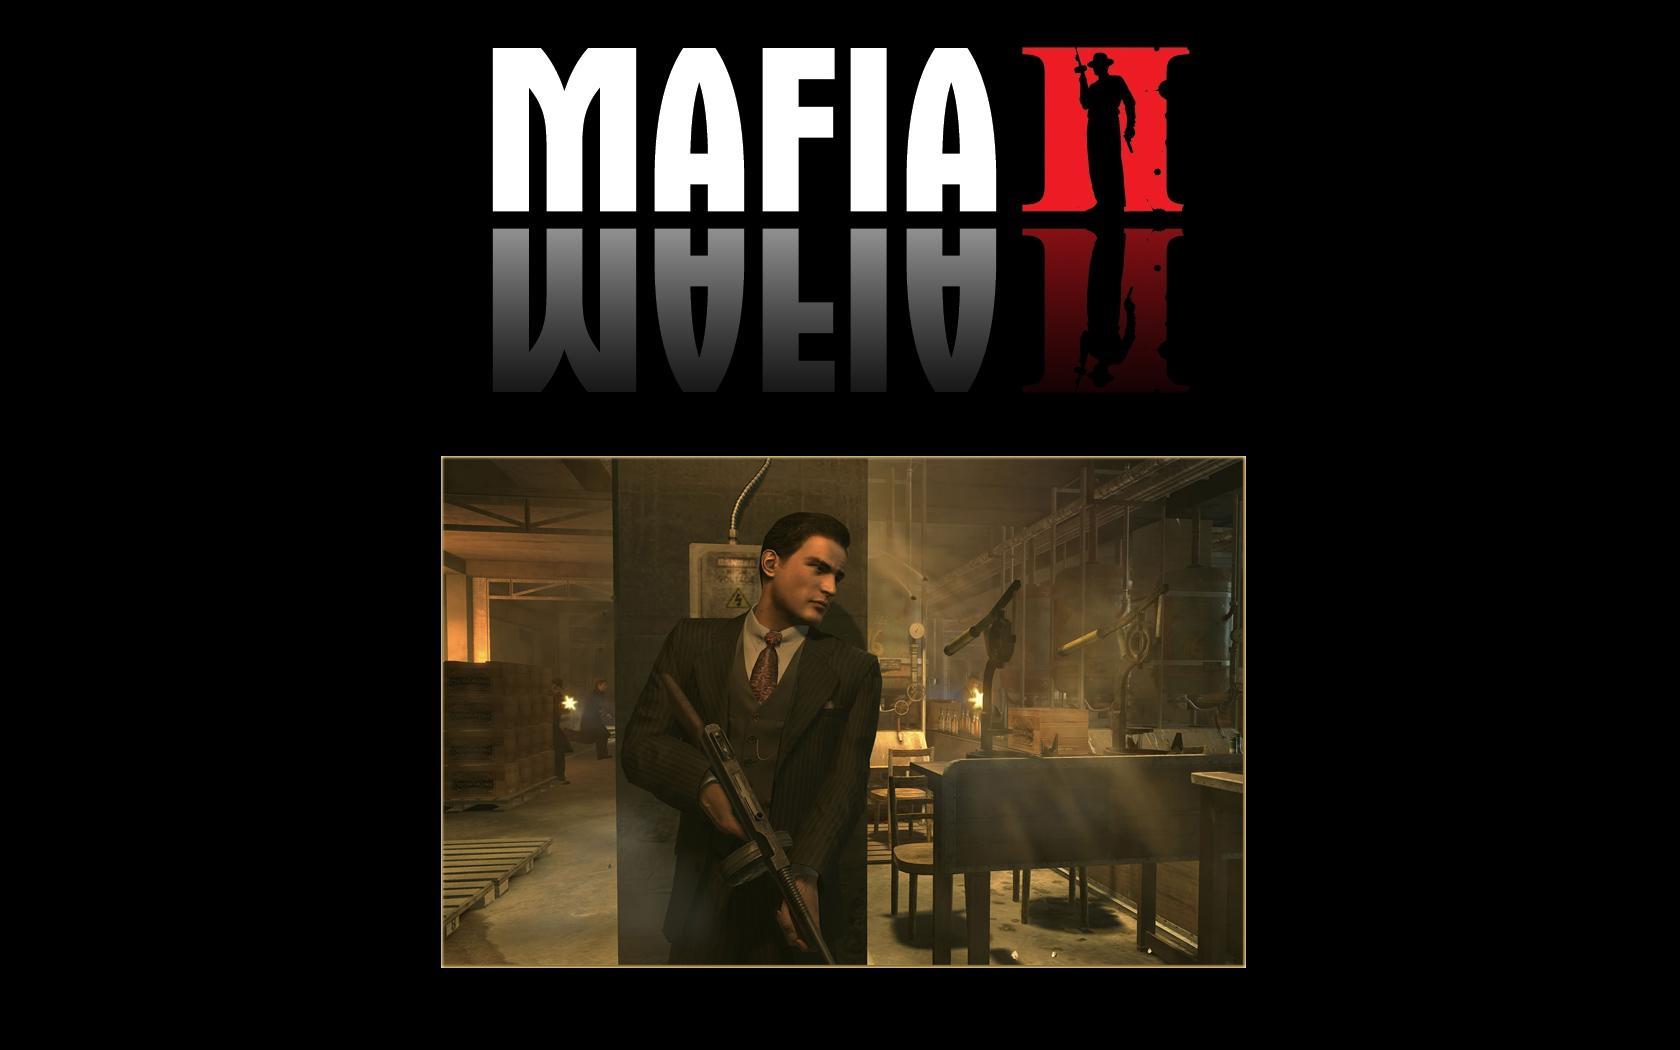 Mafia-Бандитский Петербург Коды